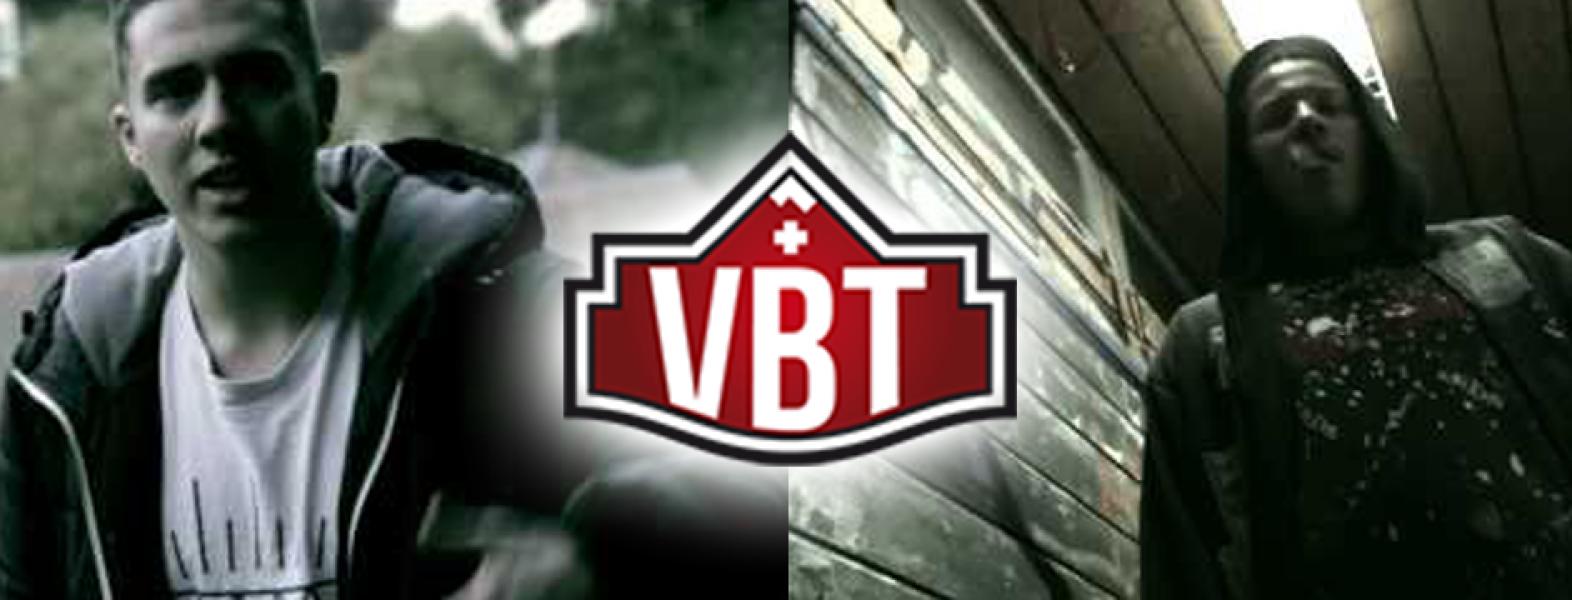 Iroas vs. Independent Ray – VBT 2012 Halbfinale